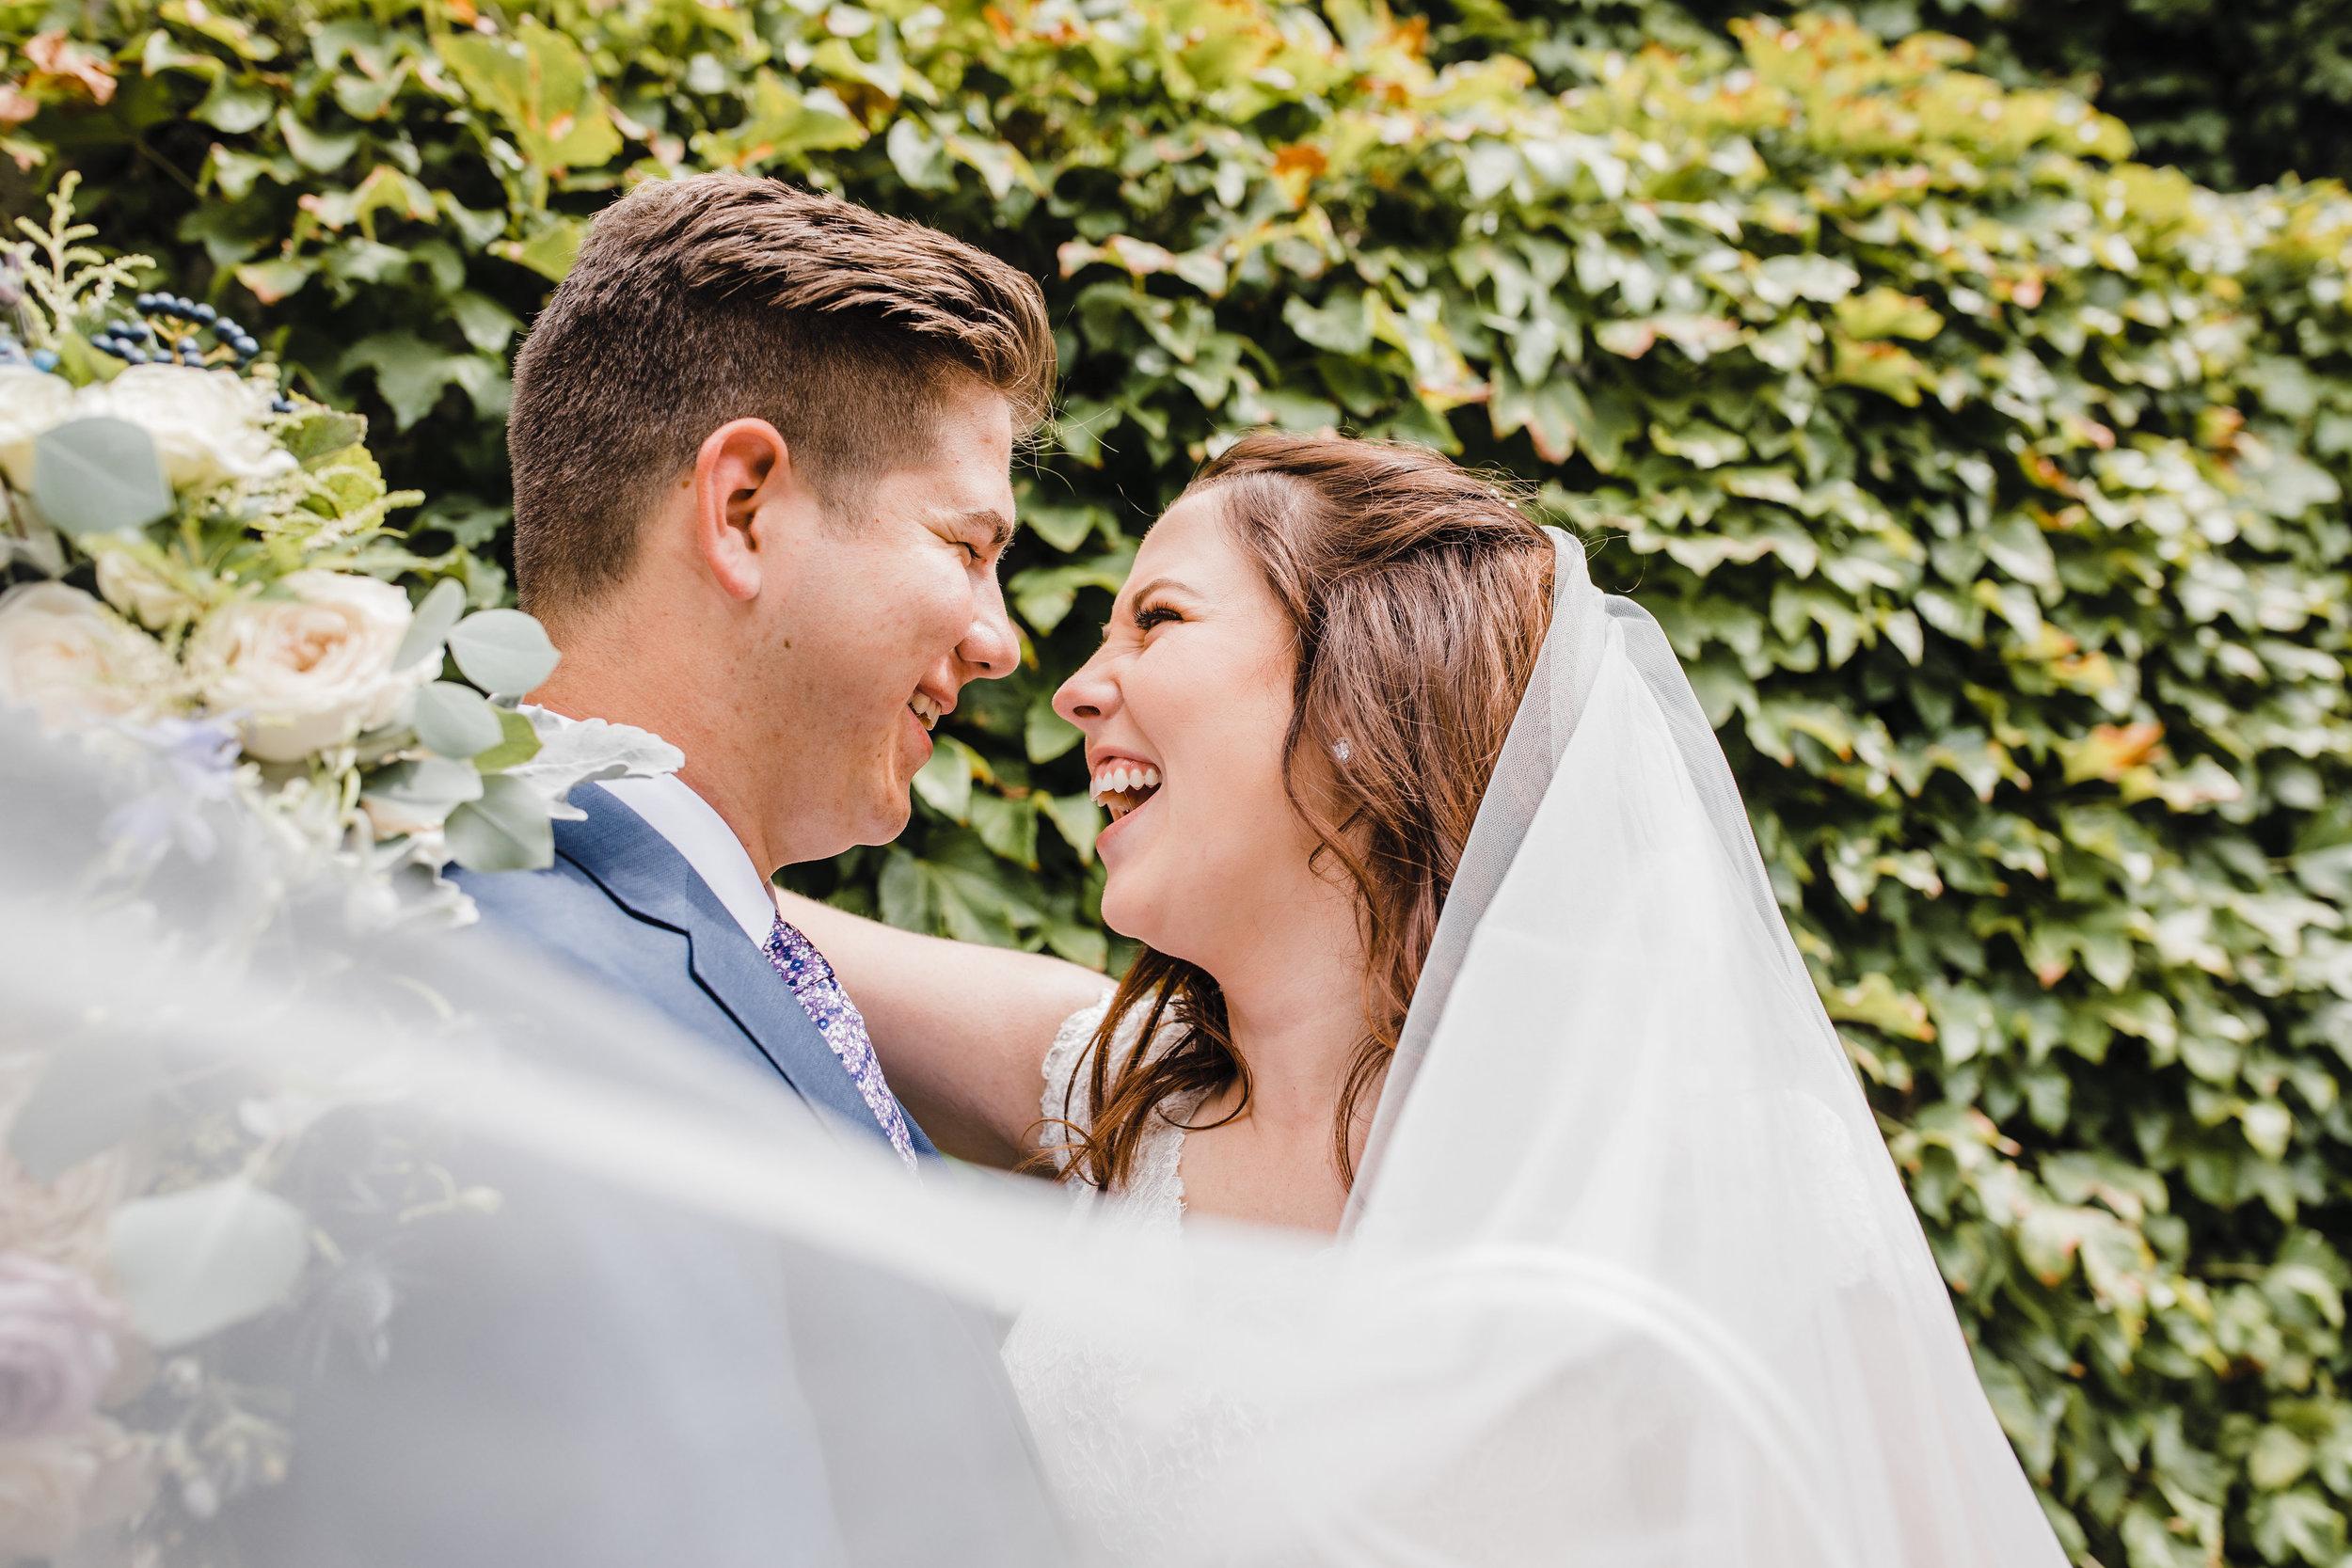 professional provo utah wedding photographer billowing veil laughing romantic playful ivy backdrop